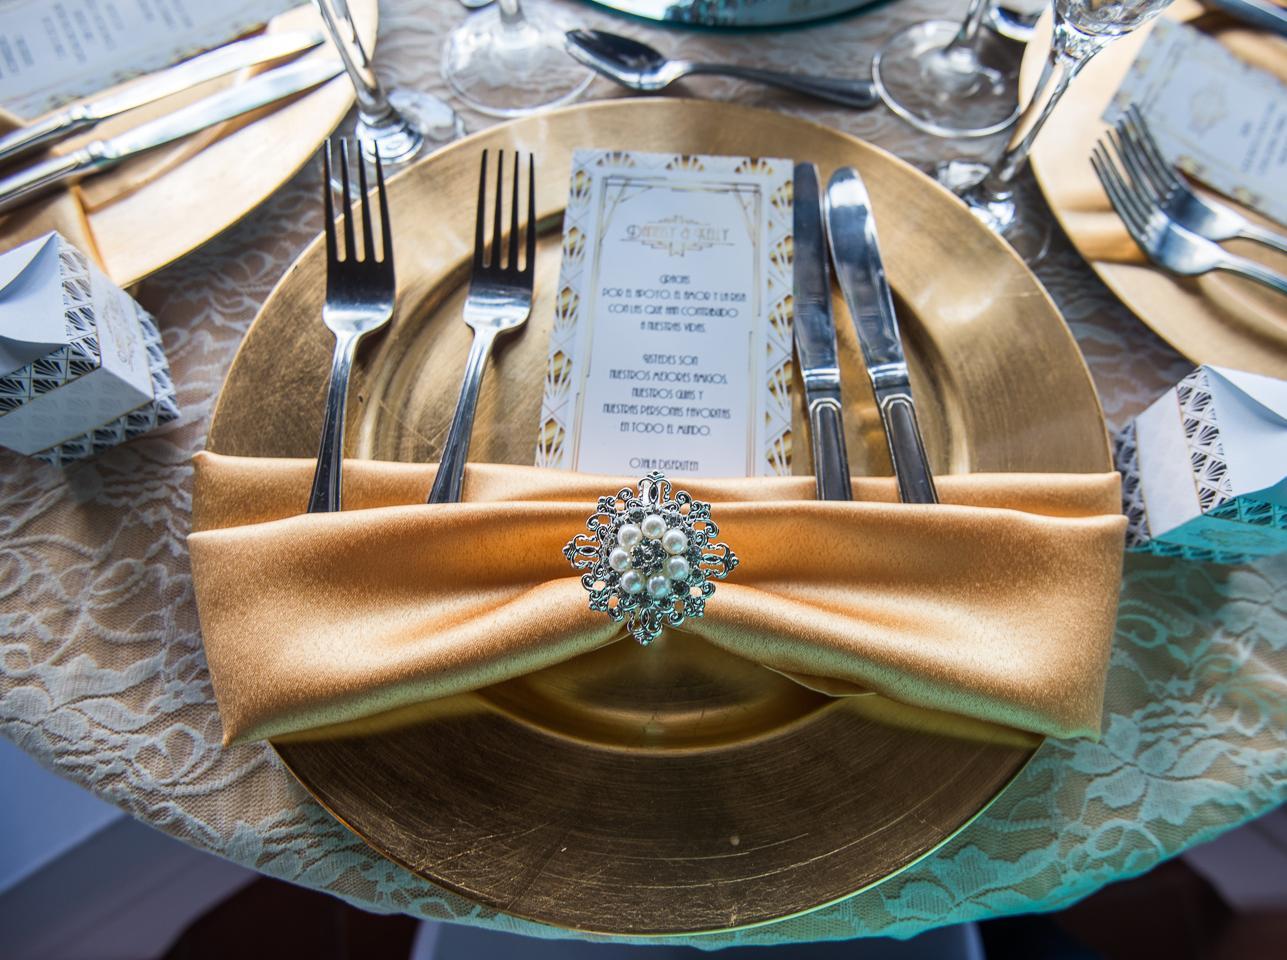 bodas-vintage-gran-gatsby-cuba-10391.jpg